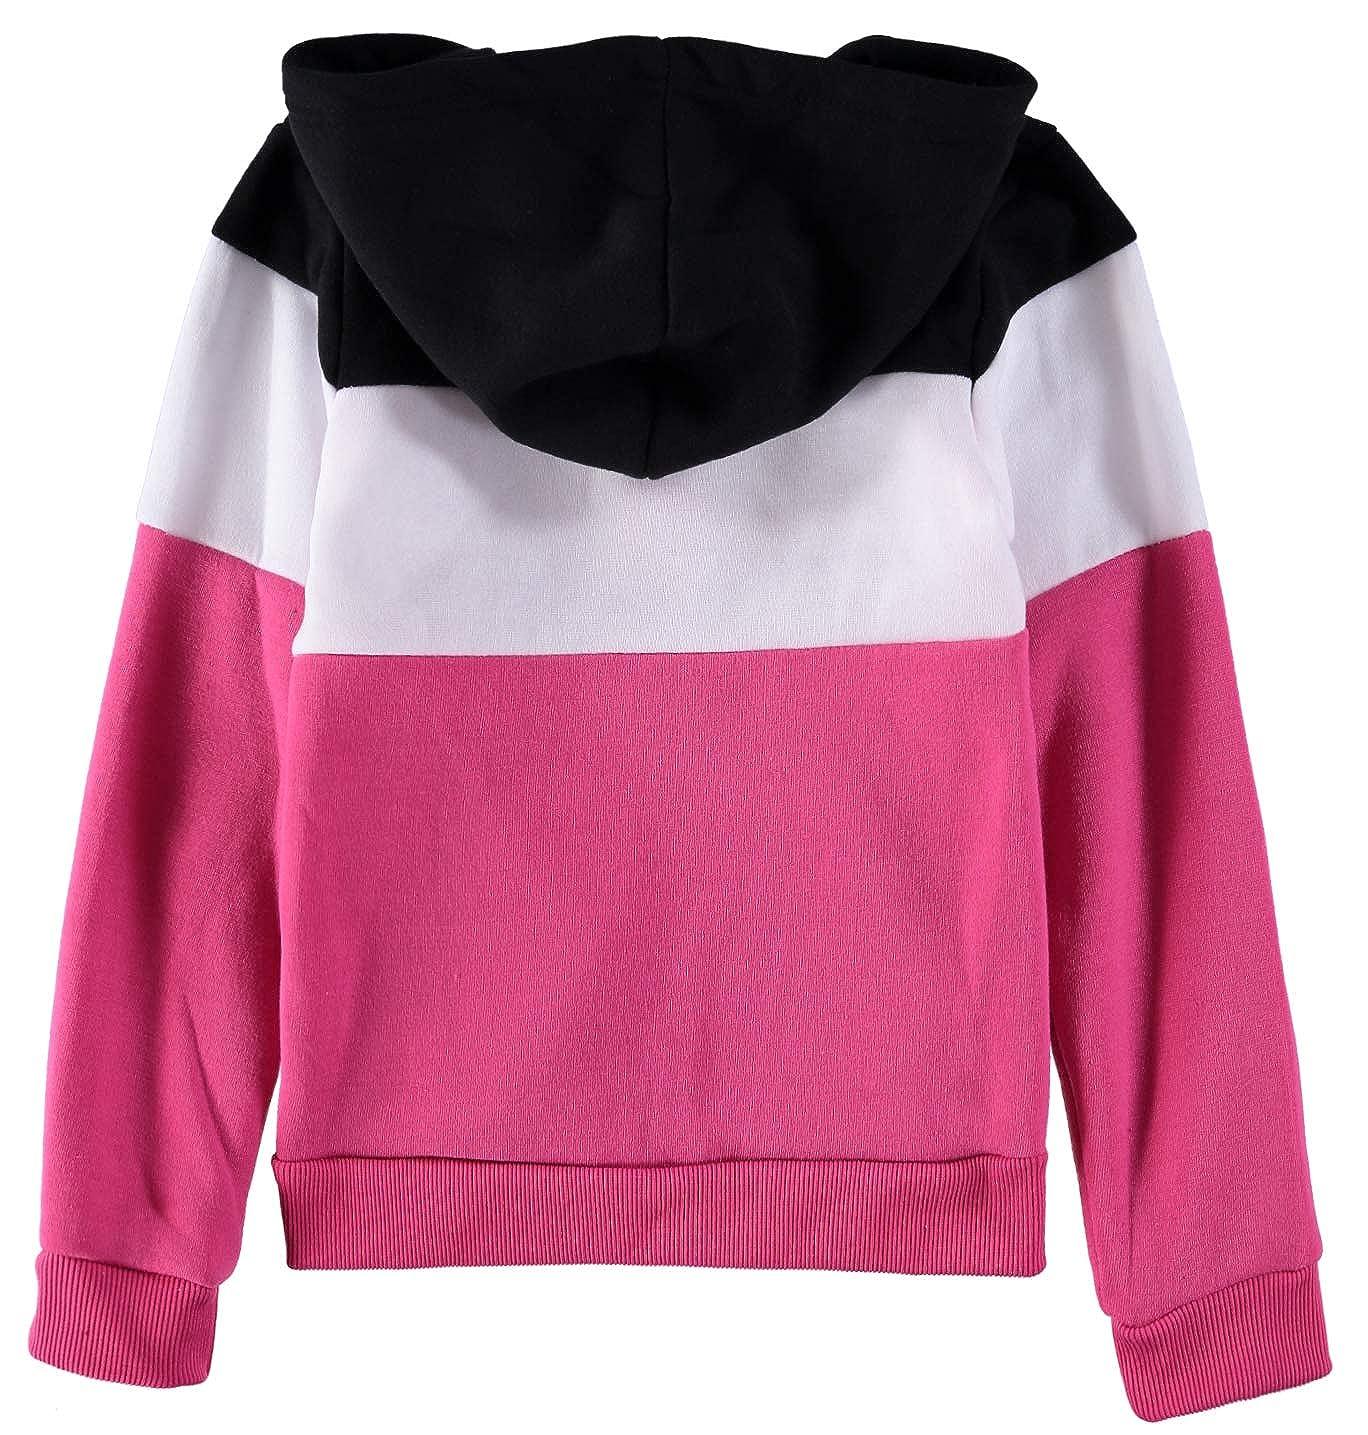 Star Ride Girls 2-Piece Zip Front Hooded Sweatshirt Jogger Set